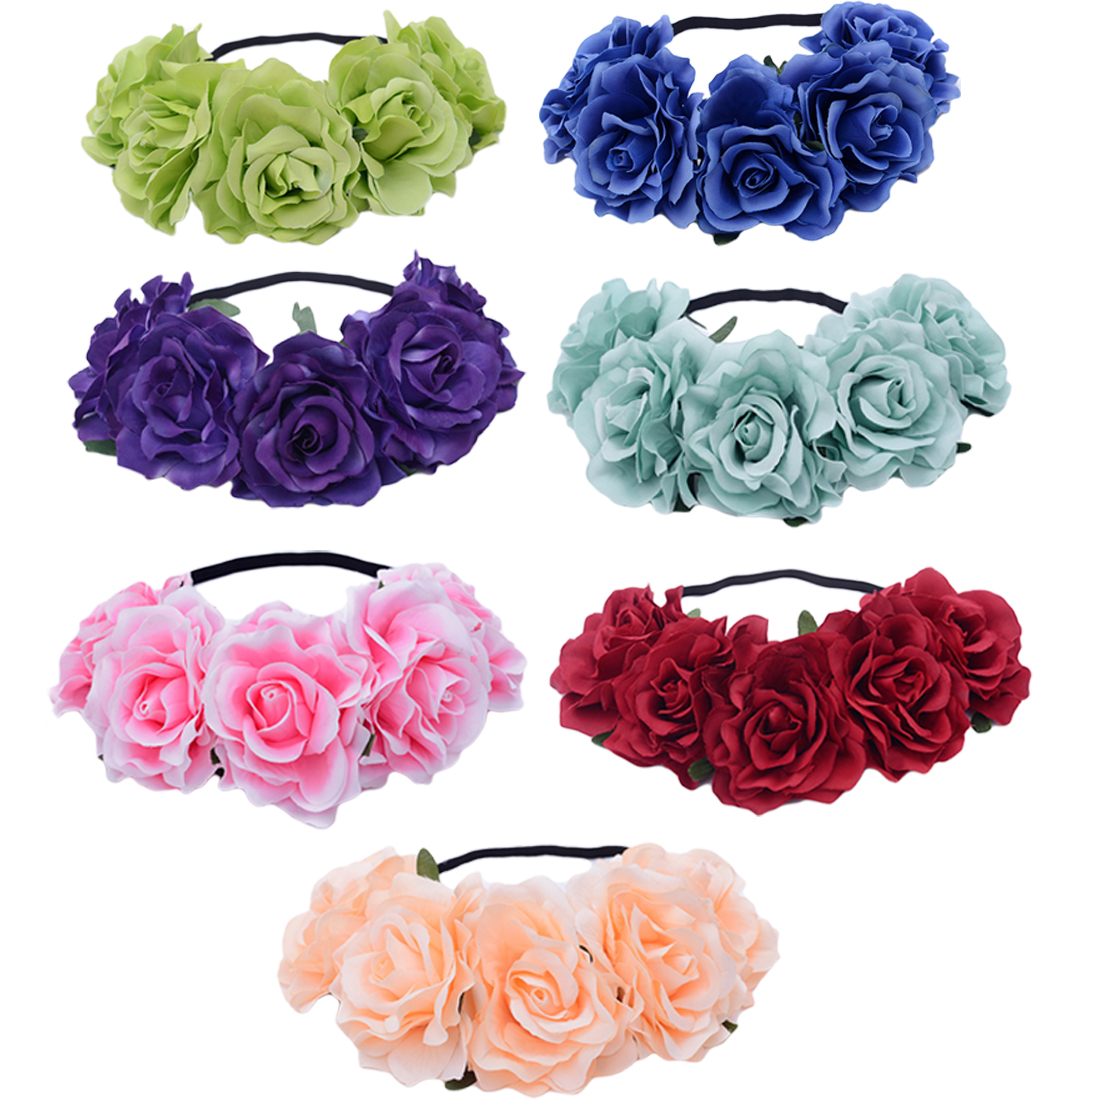 Charming Romantic Wedding Flower Crown Head Band Women Wedding Floral Head Wreath Bridesmaid Bridal Headpiece Flower Headband in Women 39 s Hair Accessories from Apparel Accessories